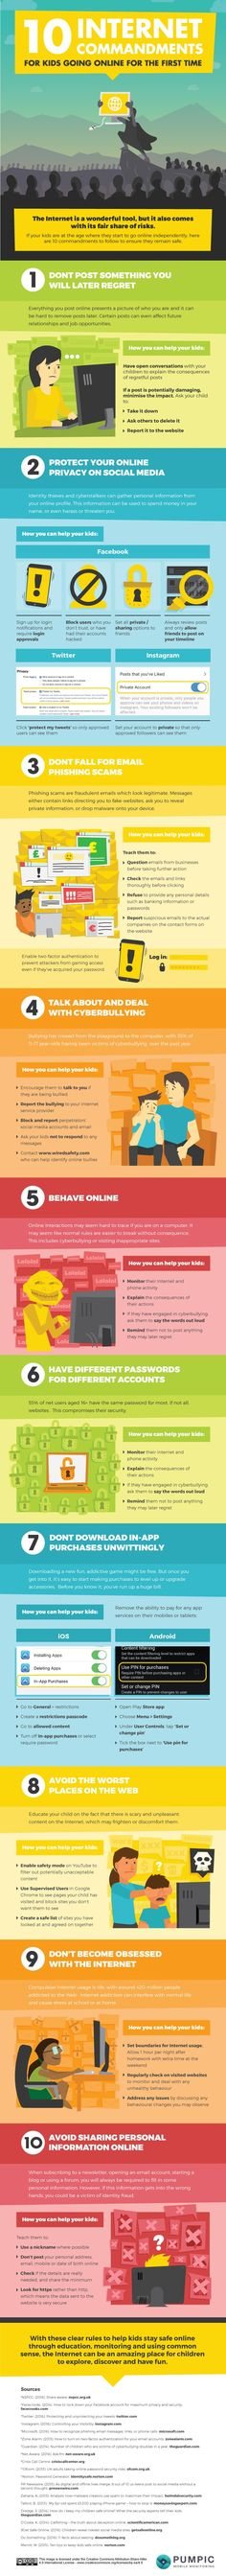 10 Internet Commandments for Kids Going Online via Pumpic